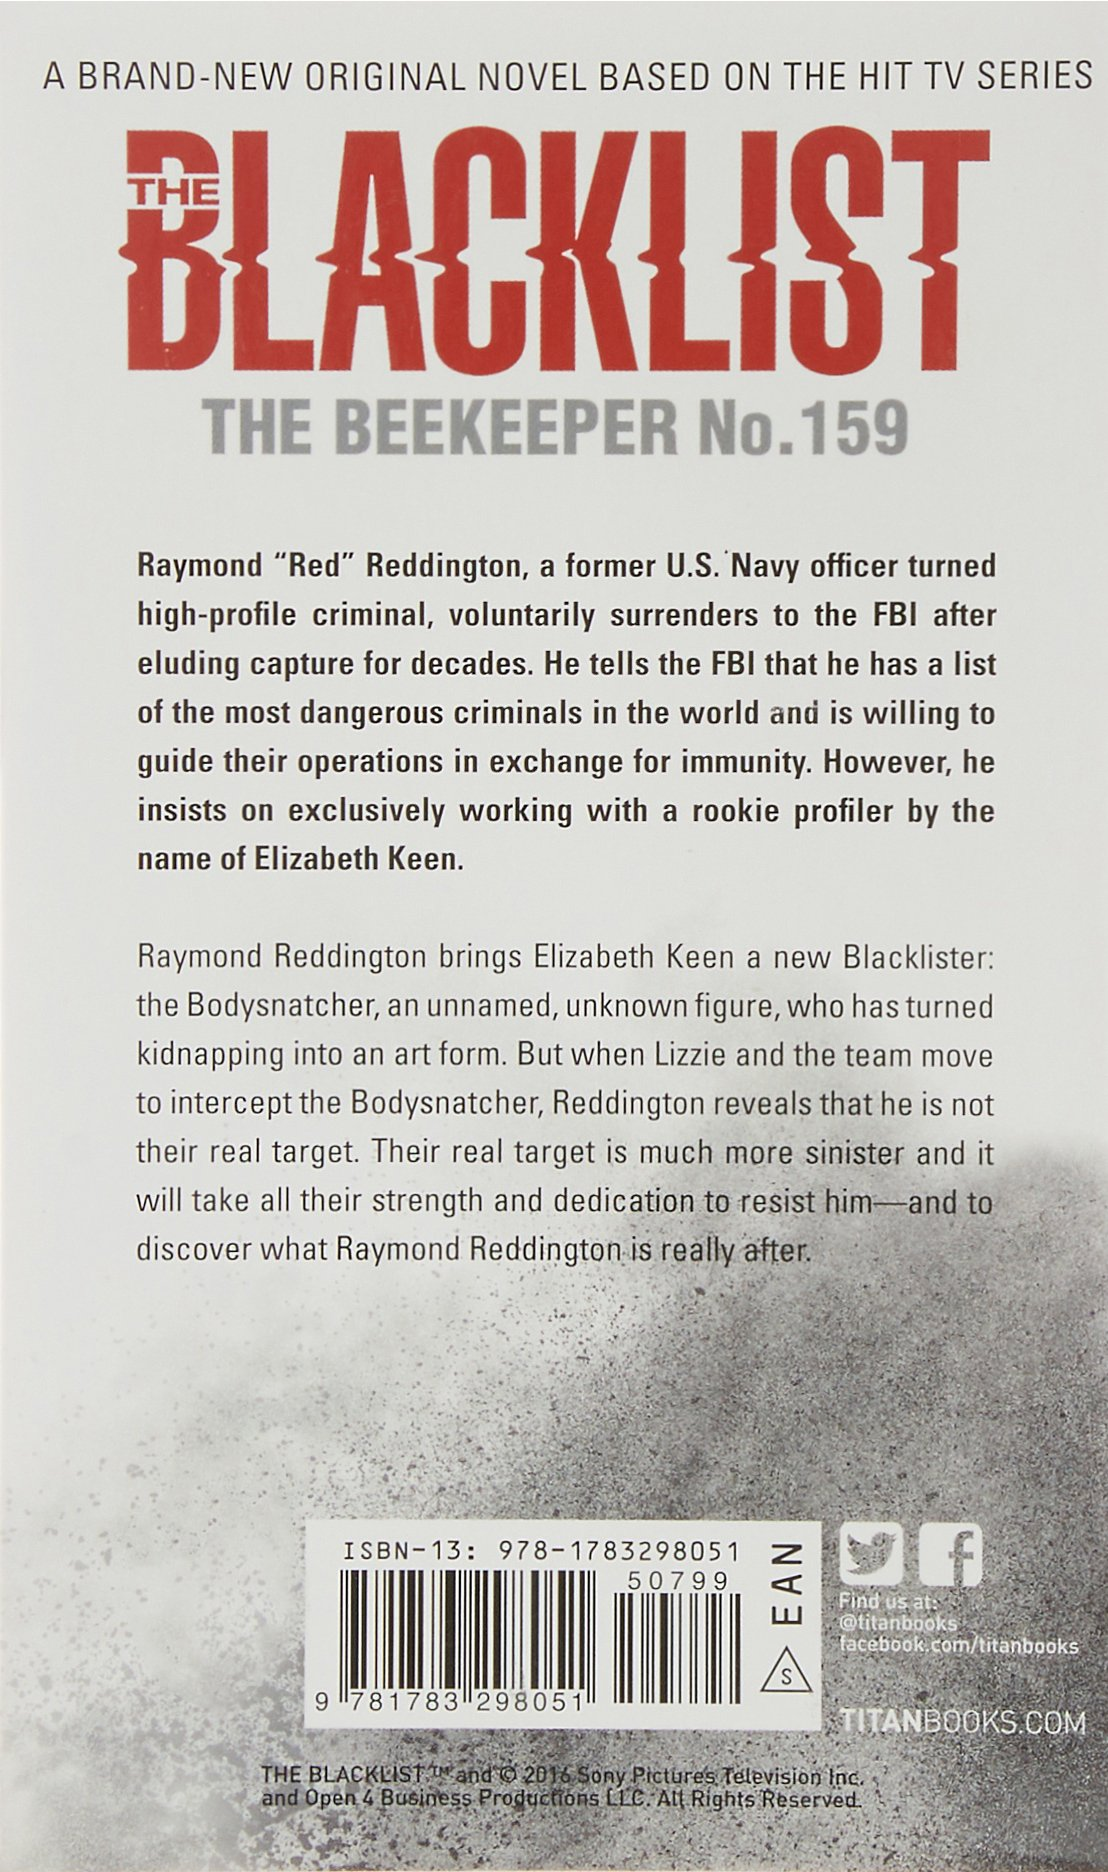 Amazon com: The Blacklist - The Beekeeper No  159